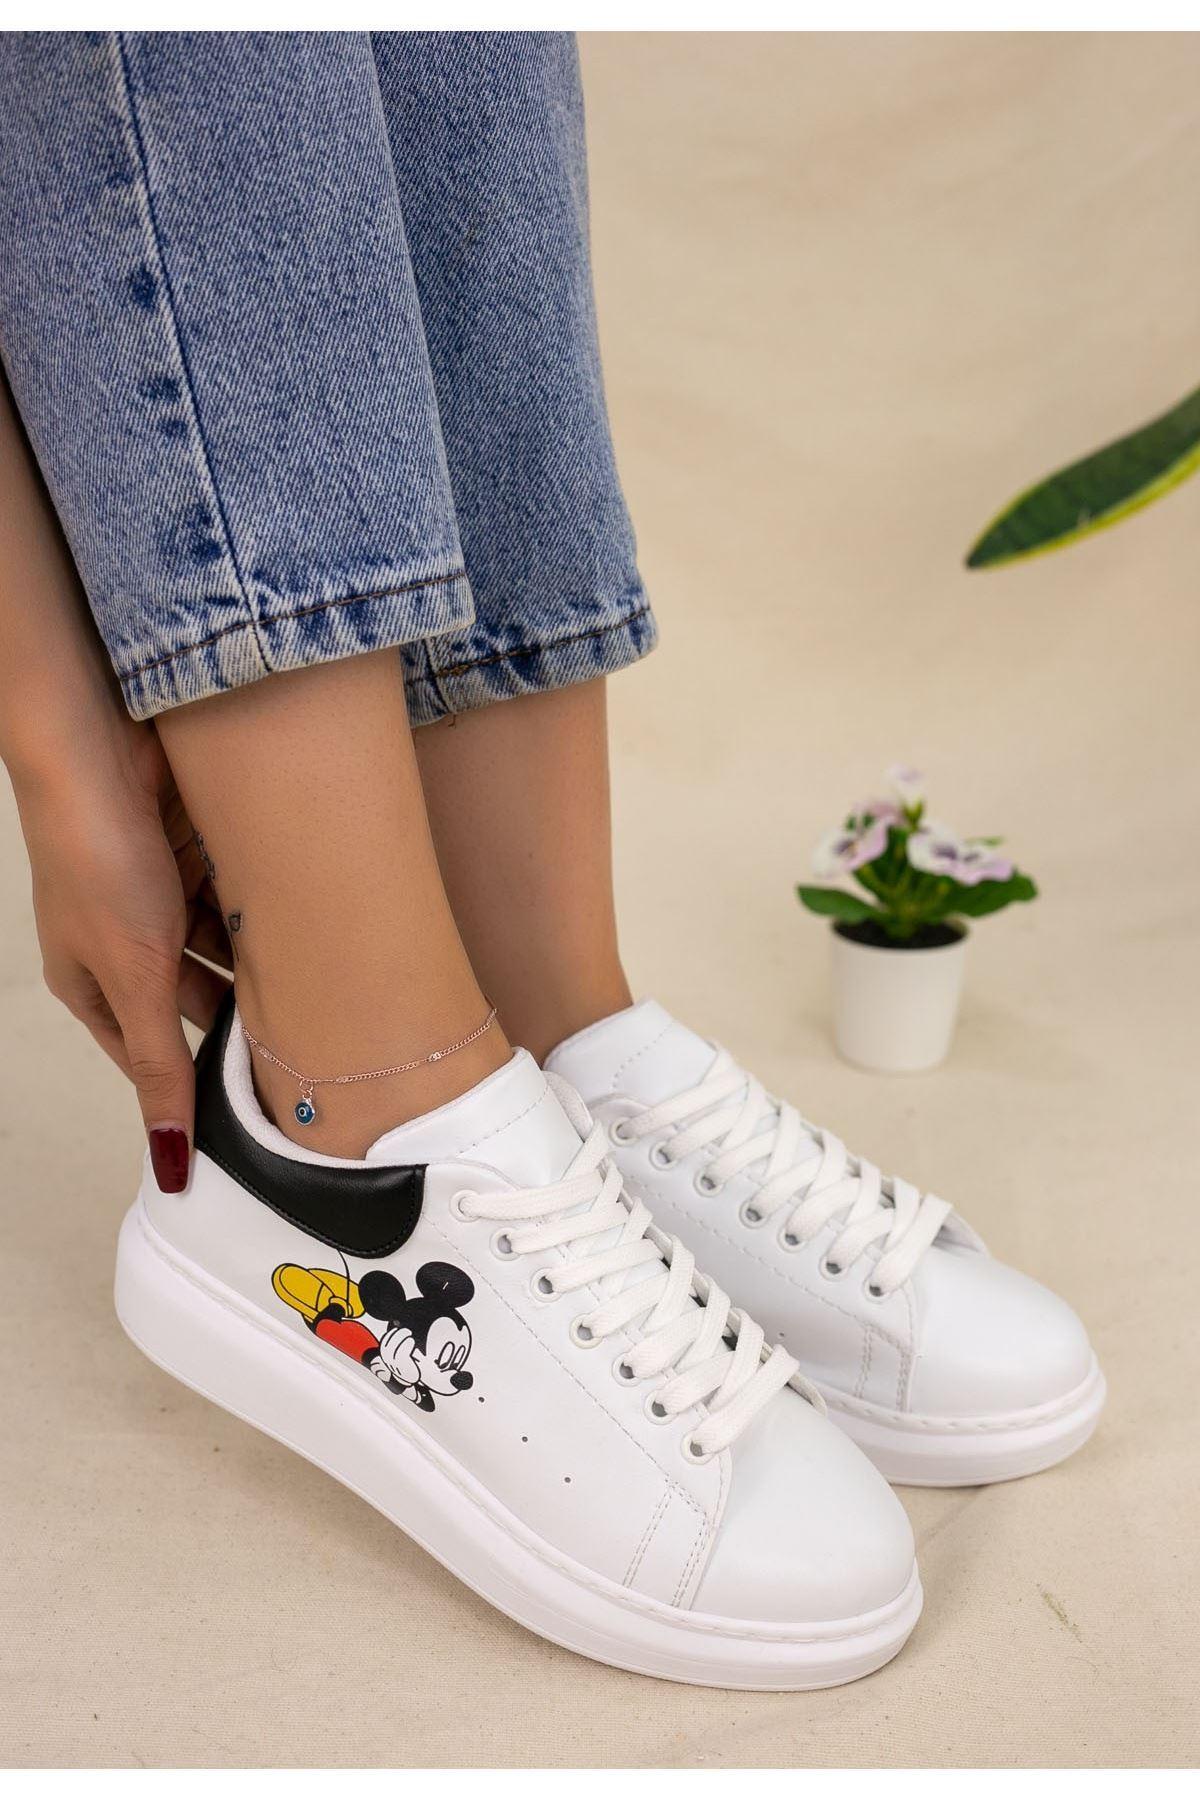 Neomixi Beyaz Mickey Mause Siyah Detaylı Spor Ayakkabı